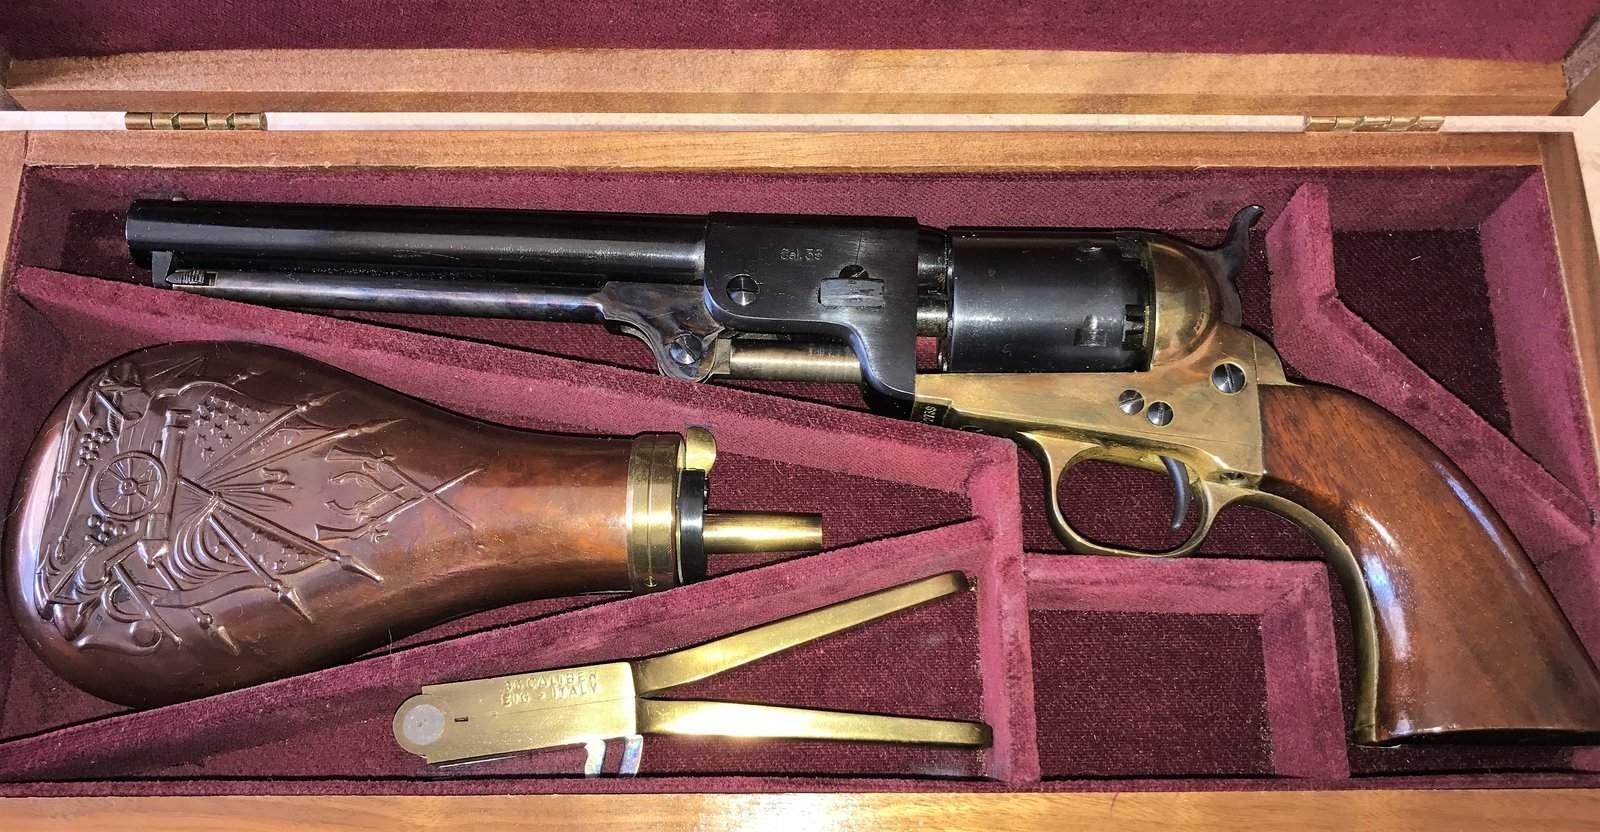 WTS WA - Navy Arms  36 caliber Black Powder Pistol in